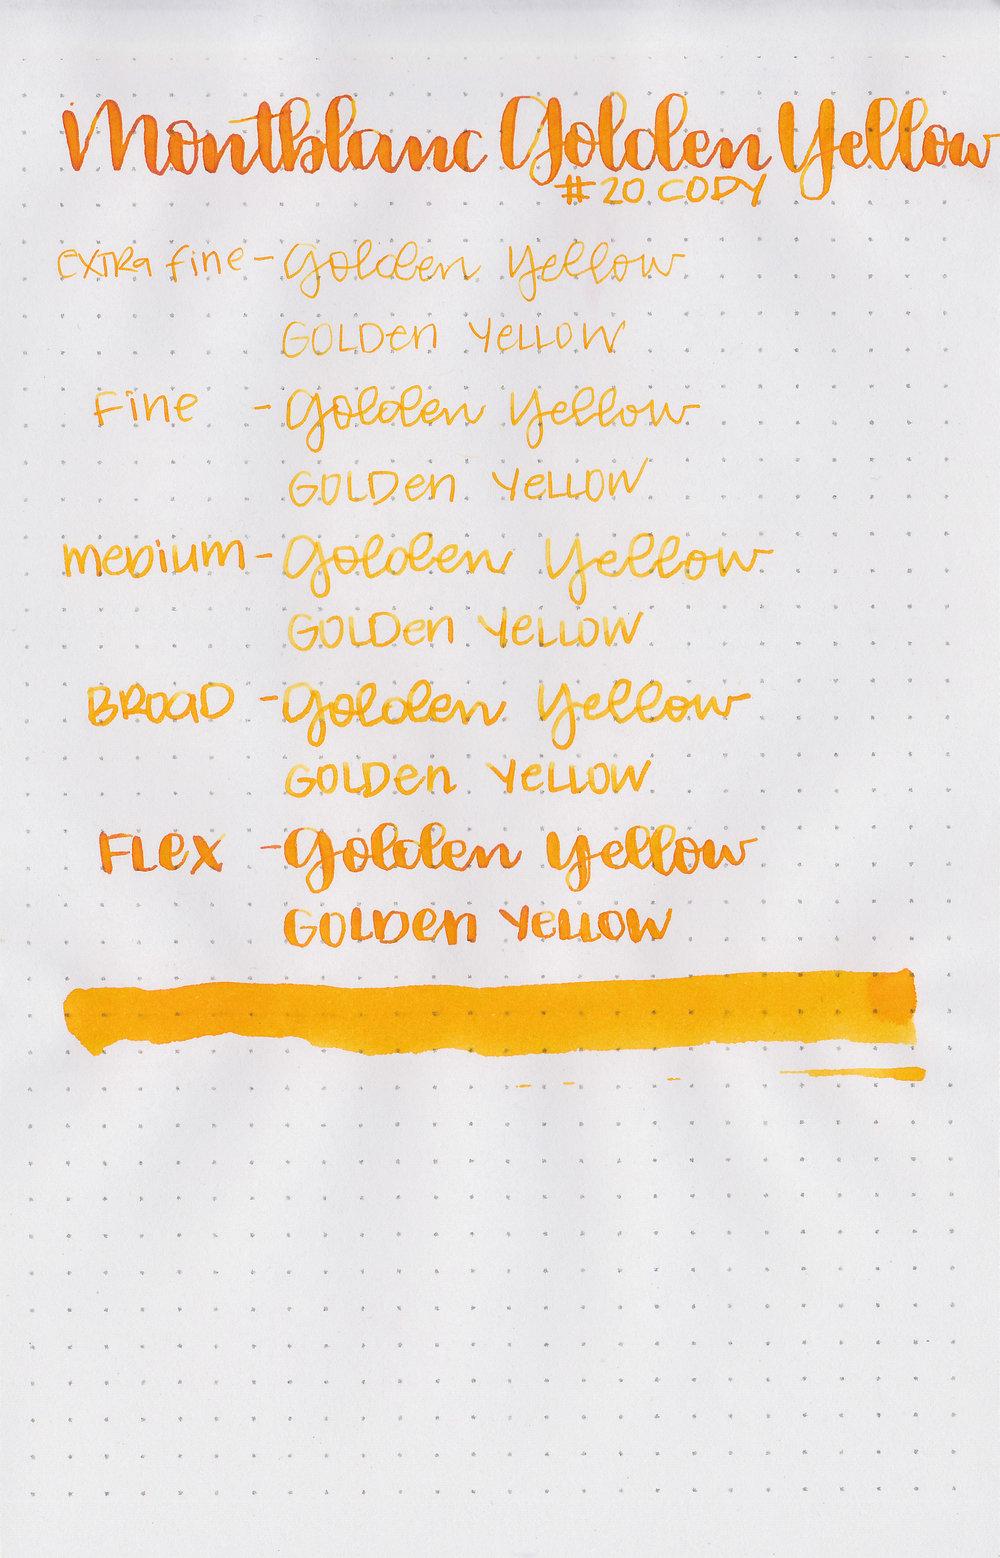 mb-golden-yellow-15.jpg